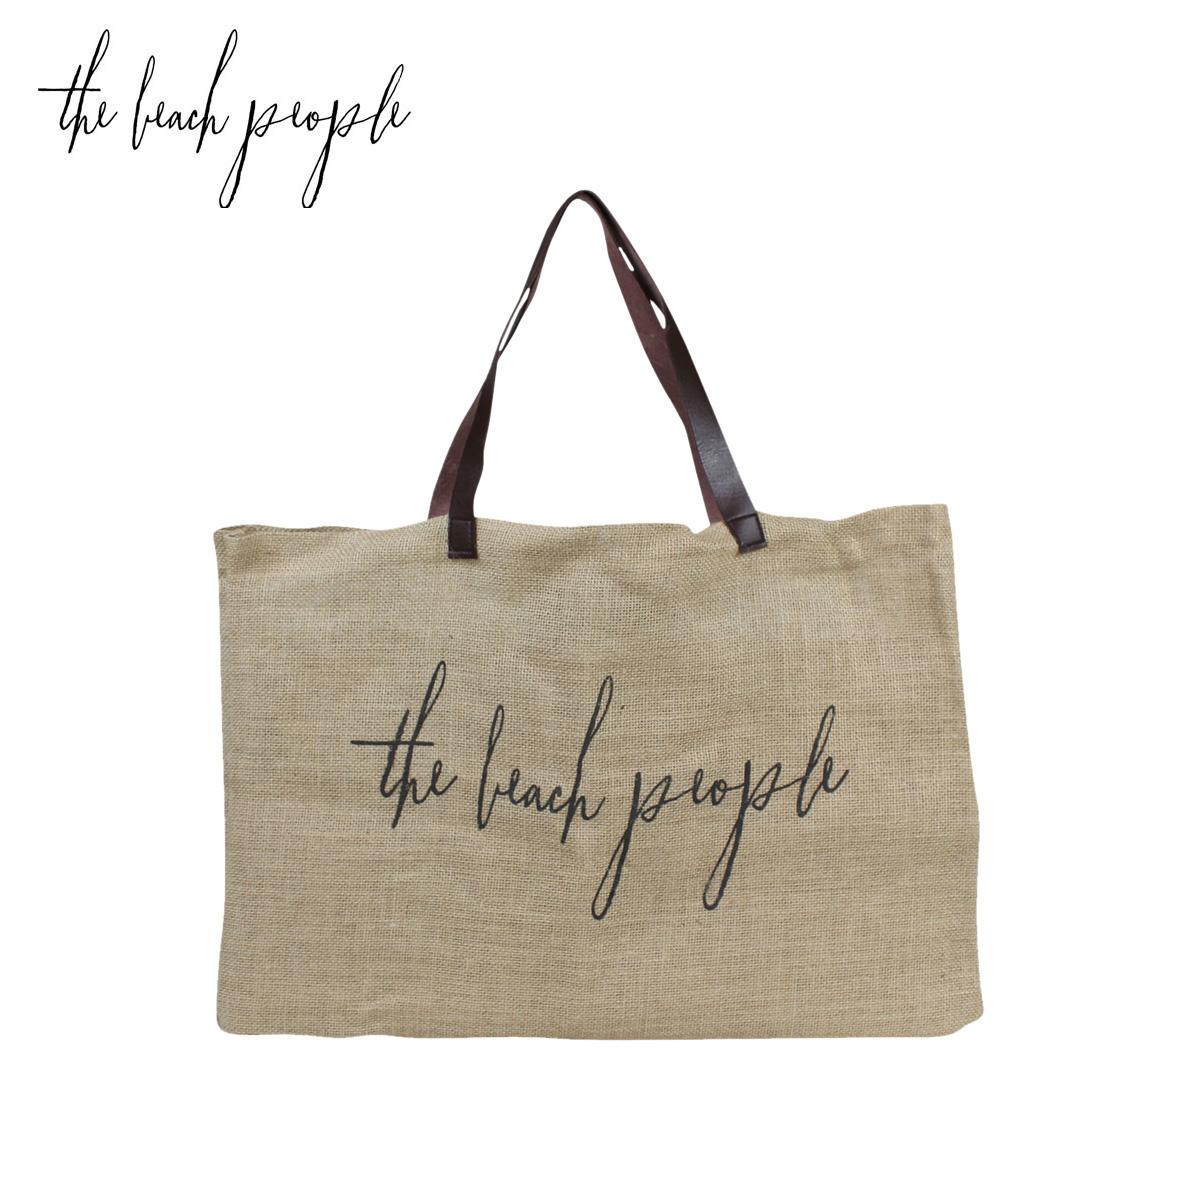 Allsports The Beach People Bag Tote Linen Jute Las 9 5 New In Stock Rakuten Global Market